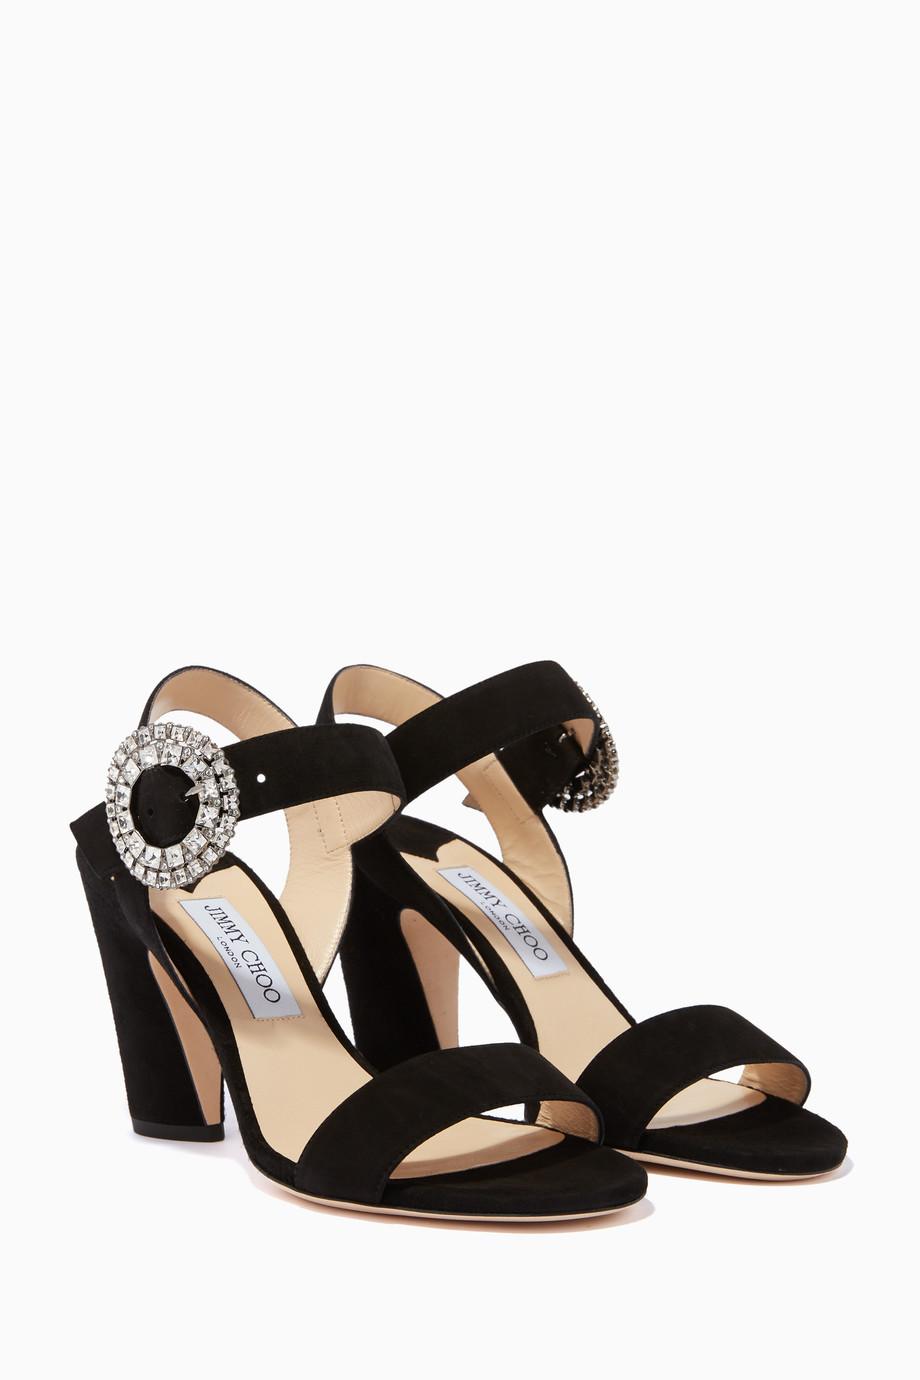 3bd732e95c9 Shop Jimmy Choo Silver Black   Silver-Crystal Mischa 85 Sandals for ...